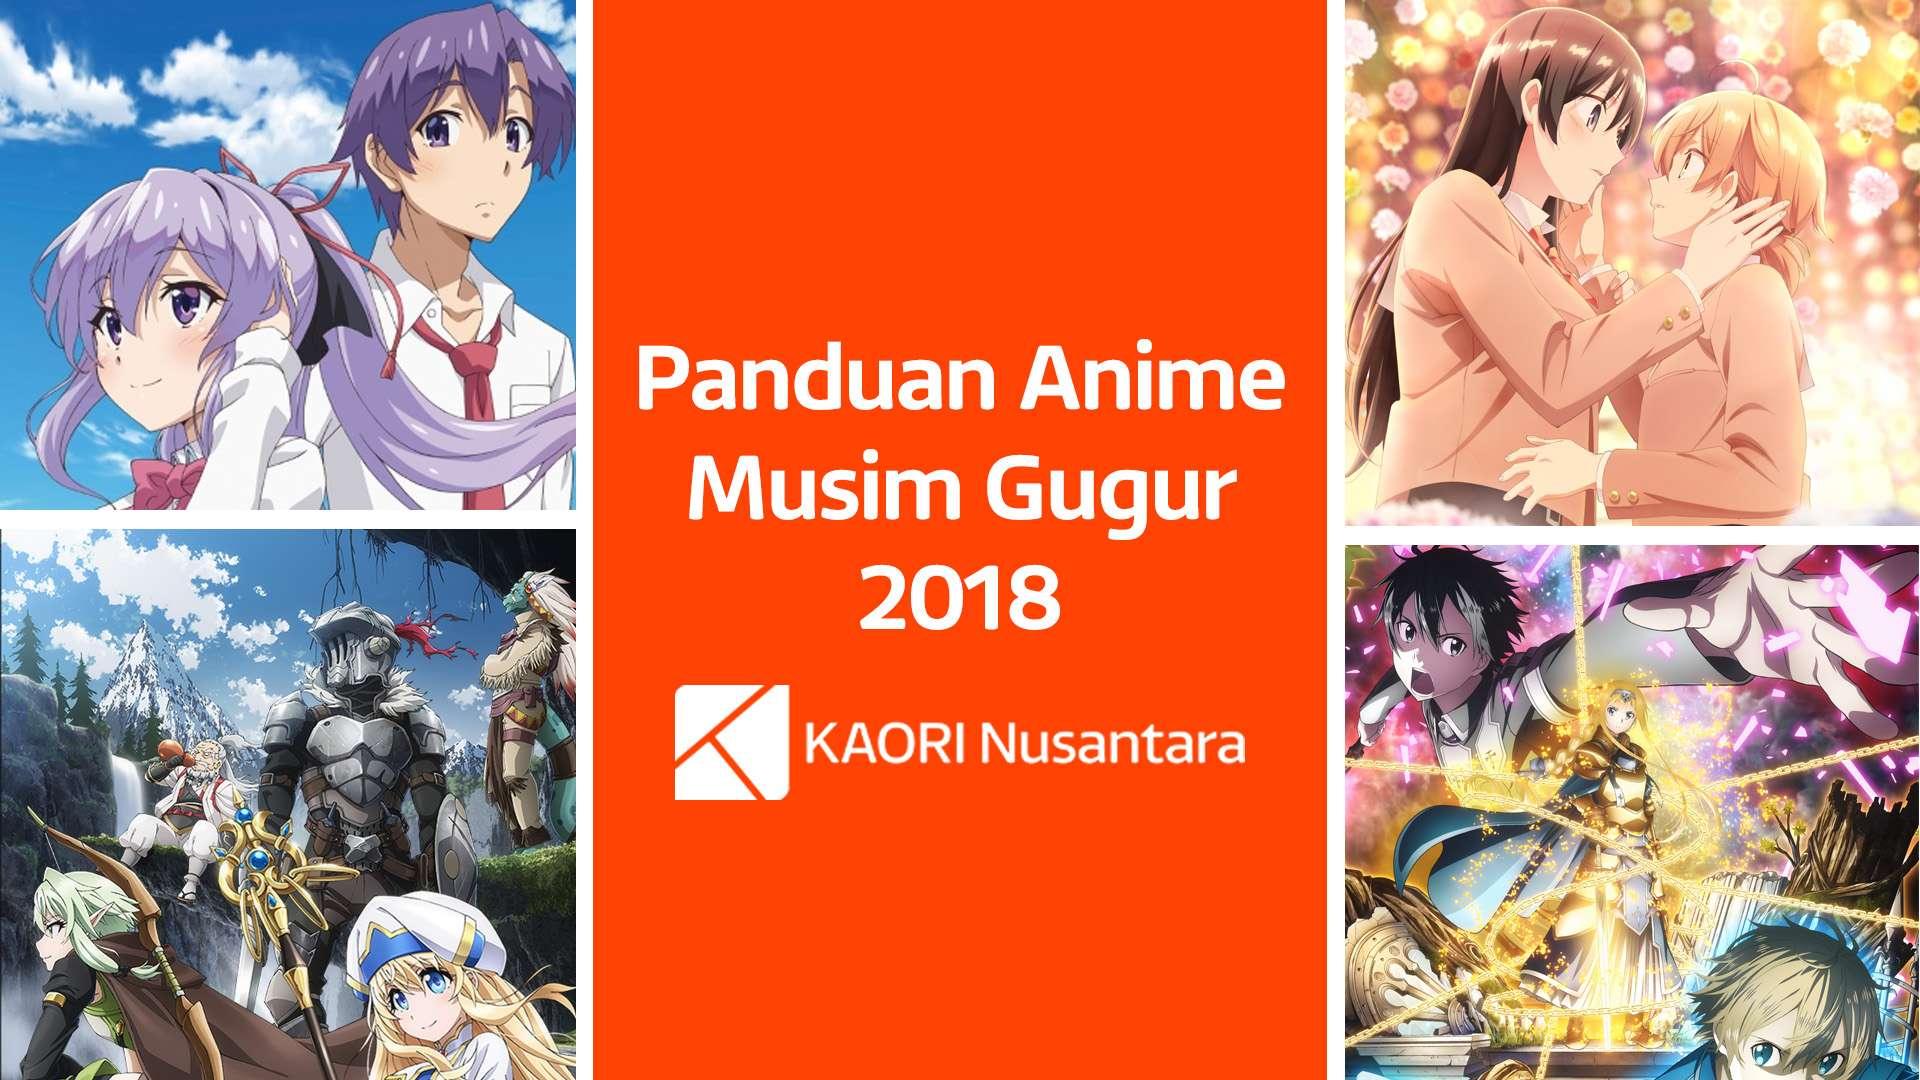 Panduan anime musiman